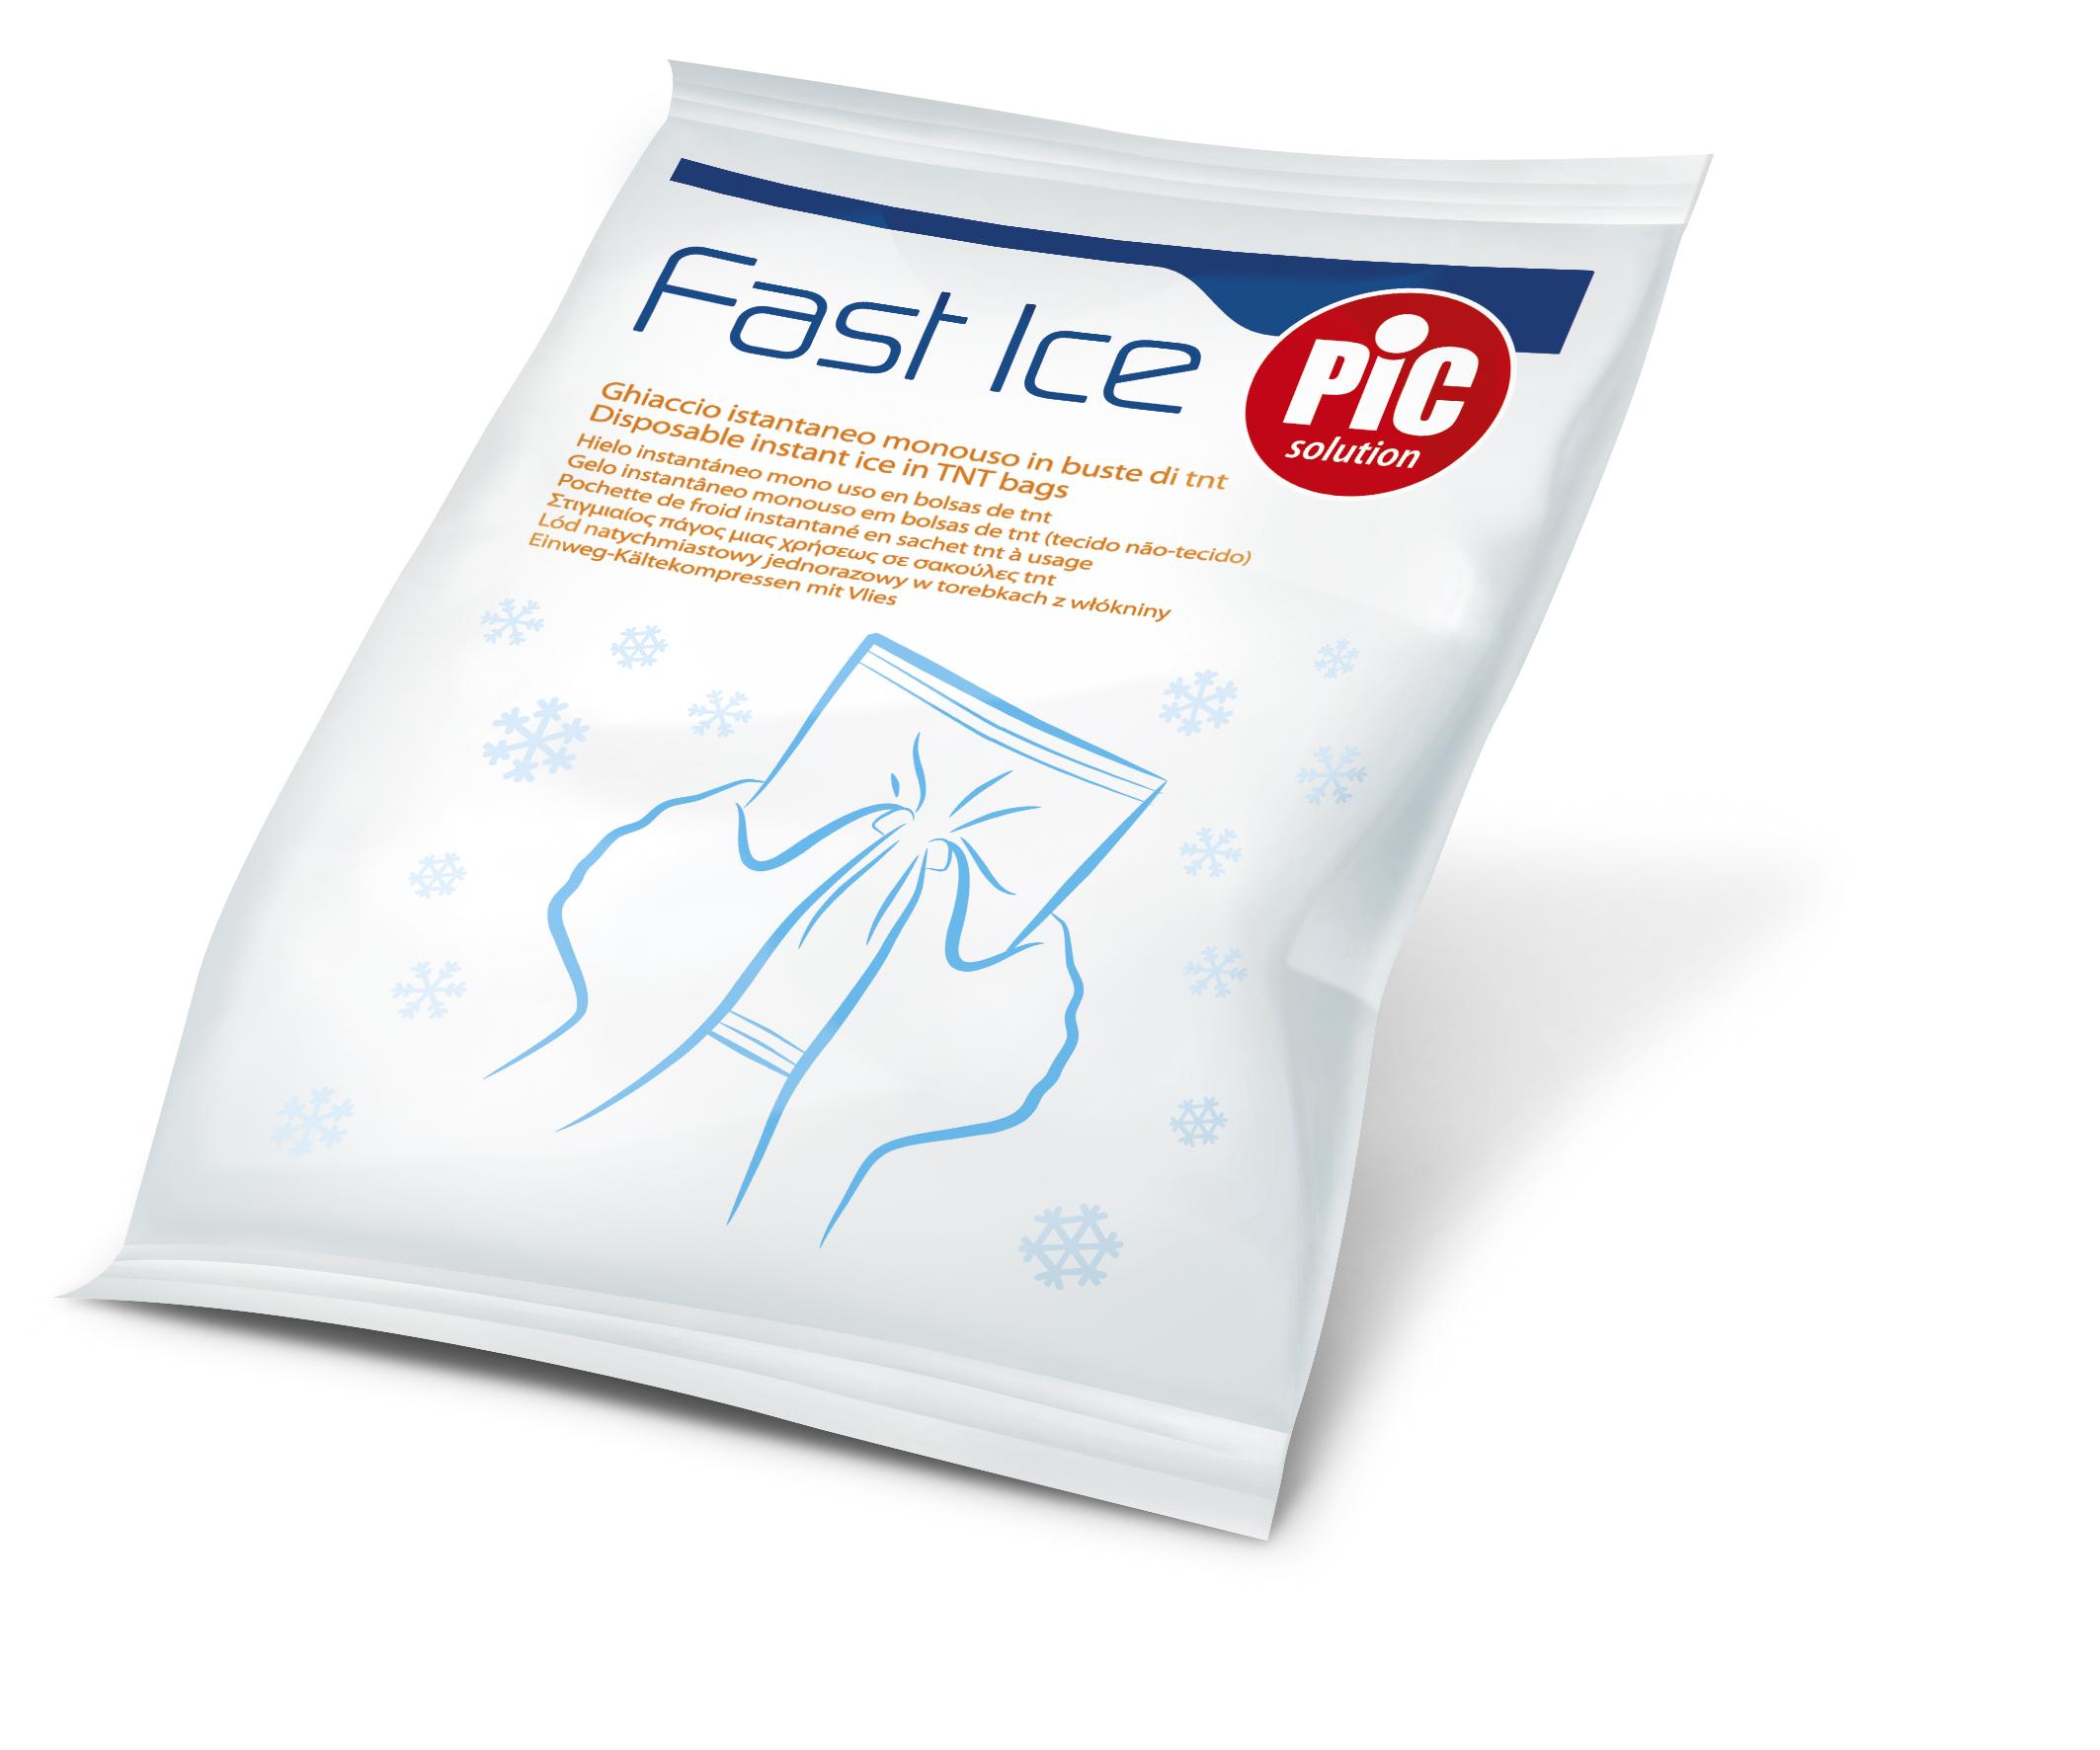 Pic Solution Fast Ice Στιγμιαίος Πάγος μιας Χρήσεως 13,5cm Χ 18cm 2τμχ